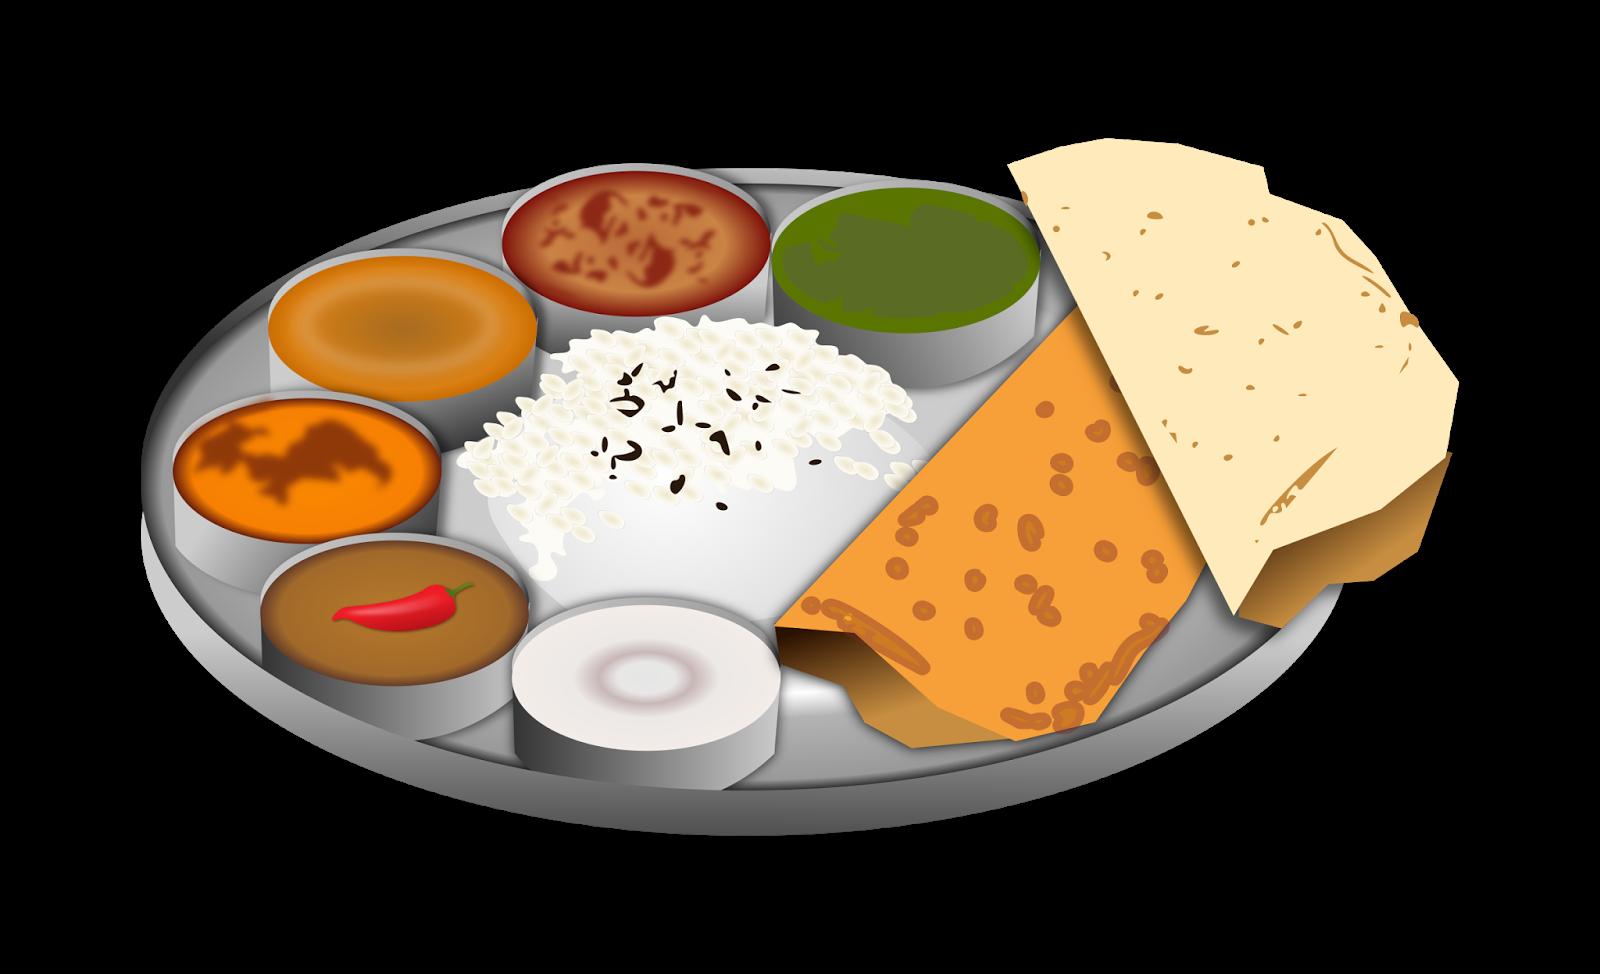 sashank express: 083 - Necessity becomes a ritual